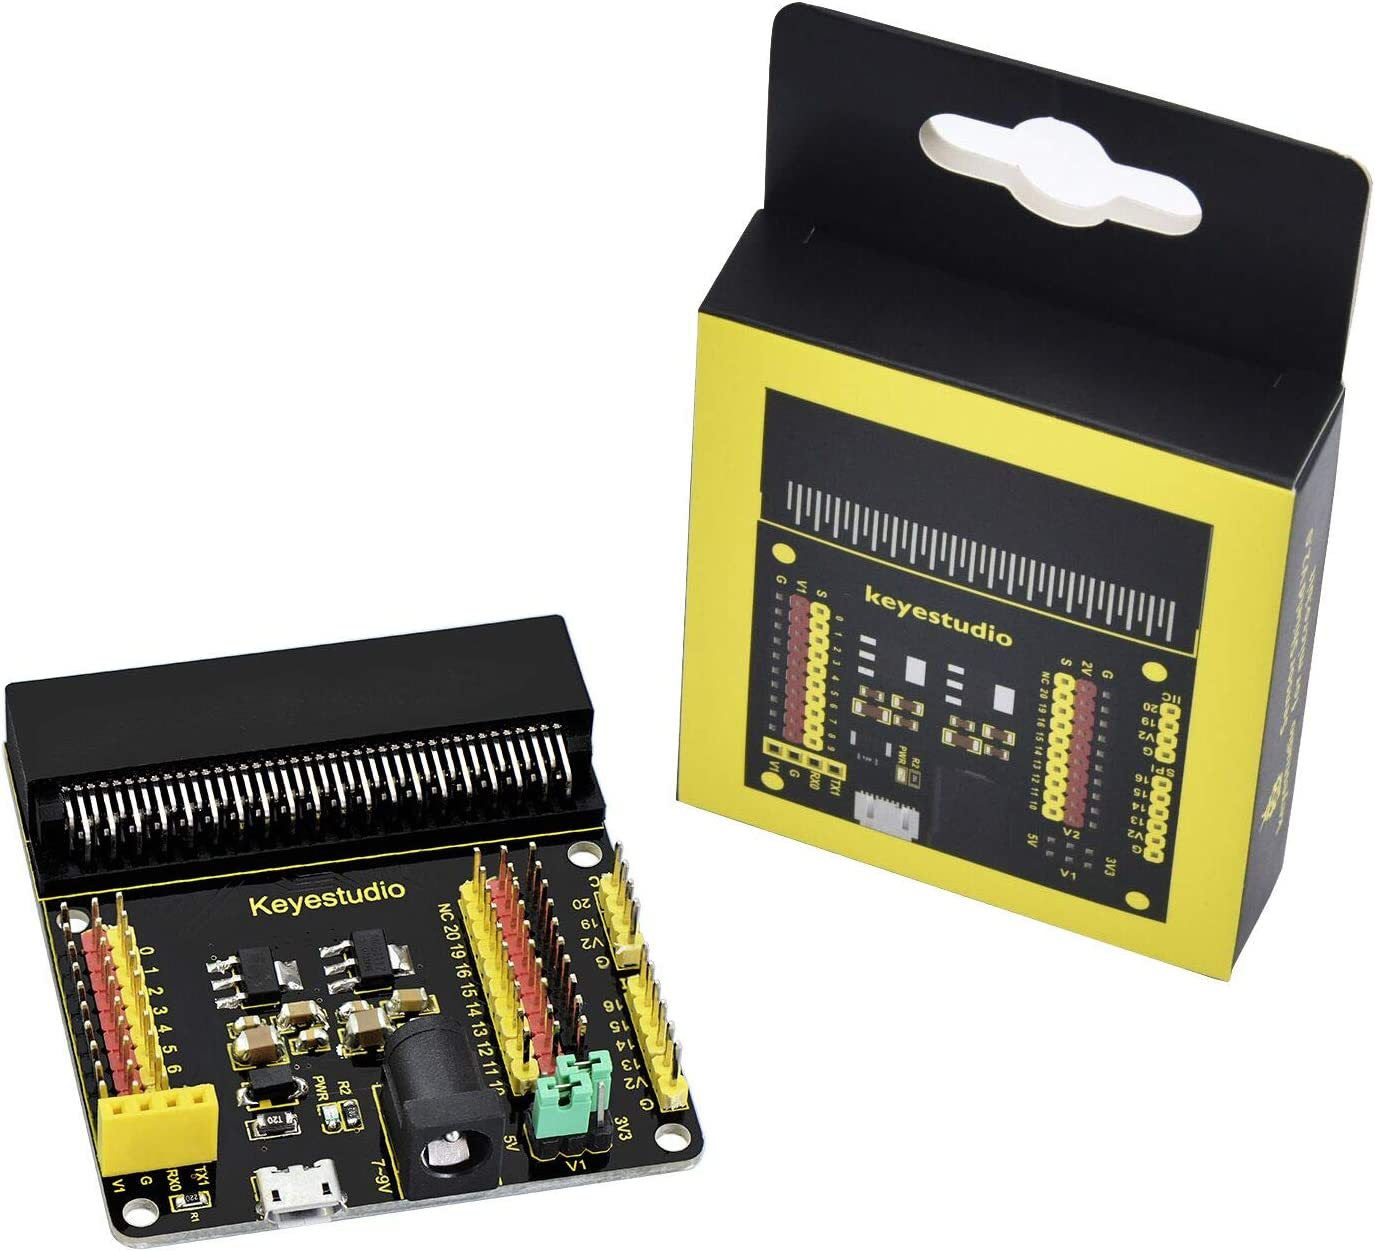 Dallas Super popular specialty store Mall KEYESTUDIO Microbit Sensor Breakout Board V2 f SPI mciro USB I2C